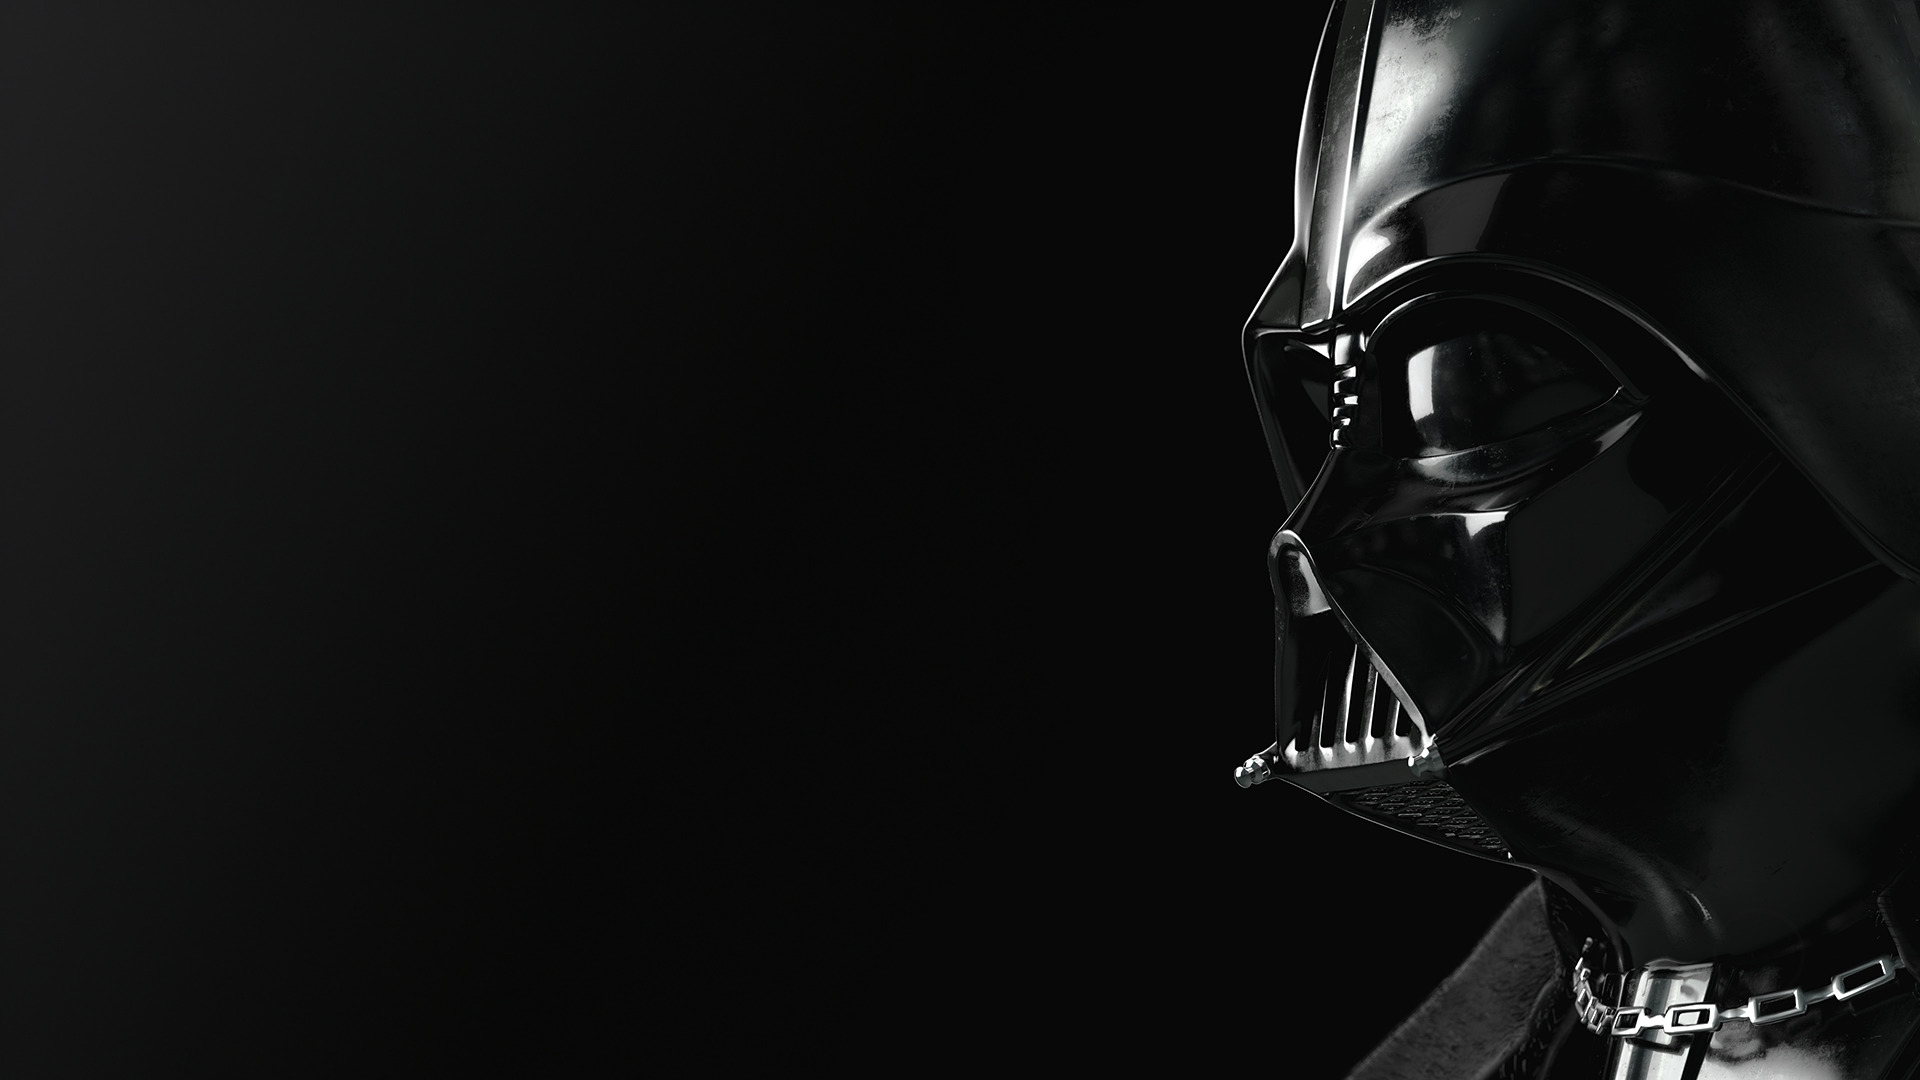 1920x1080 Star Wars Episode Vii The Force Awakens Laptop Full Hd